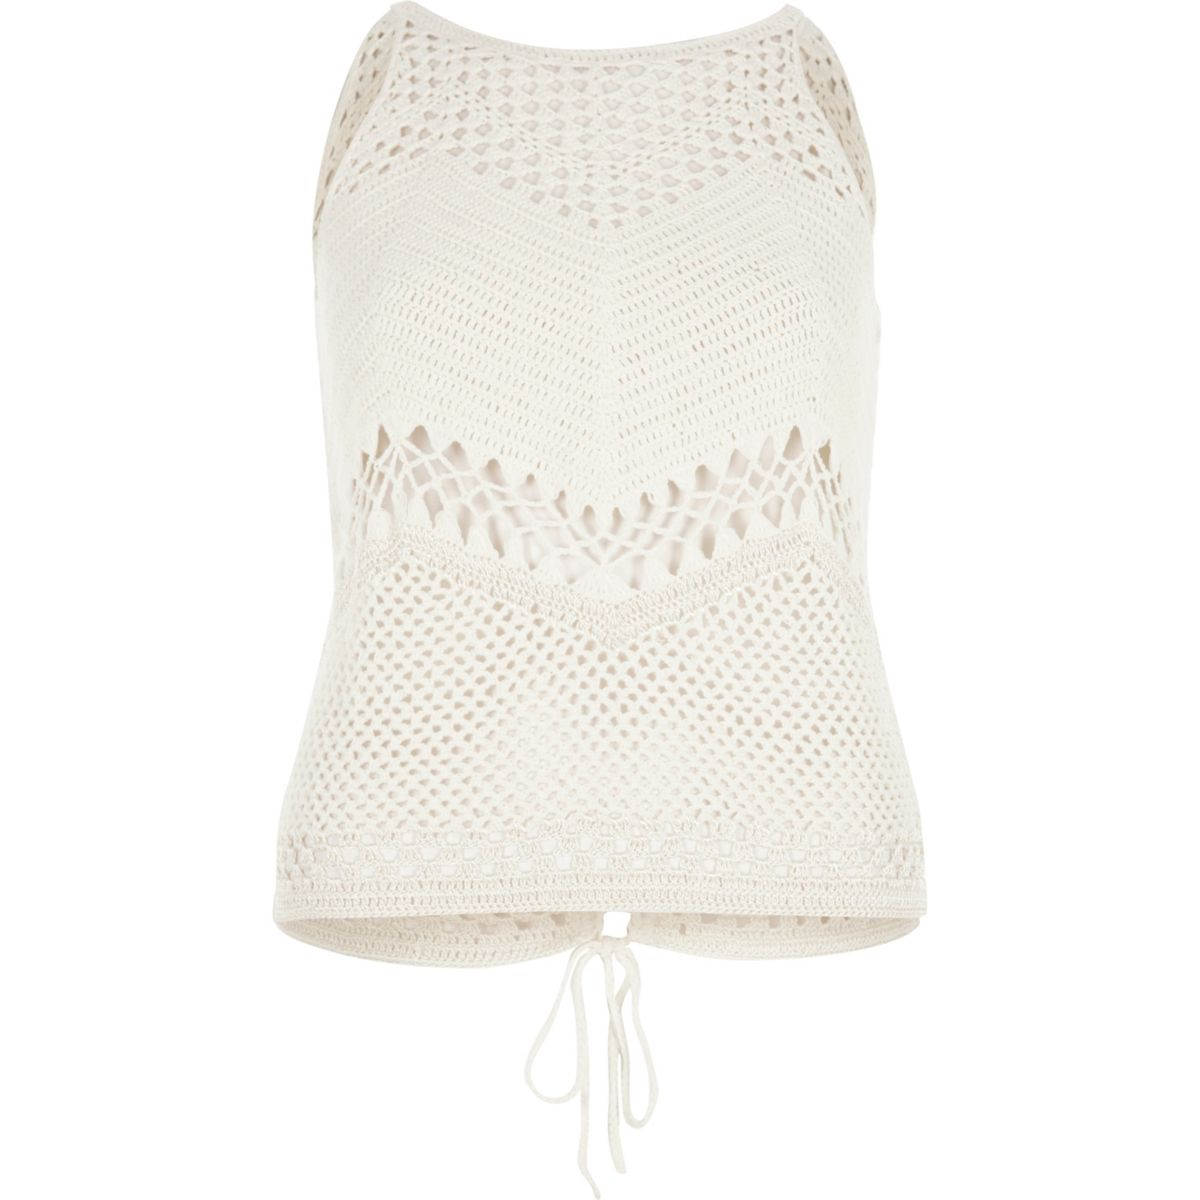 Cream crochet open back tank top